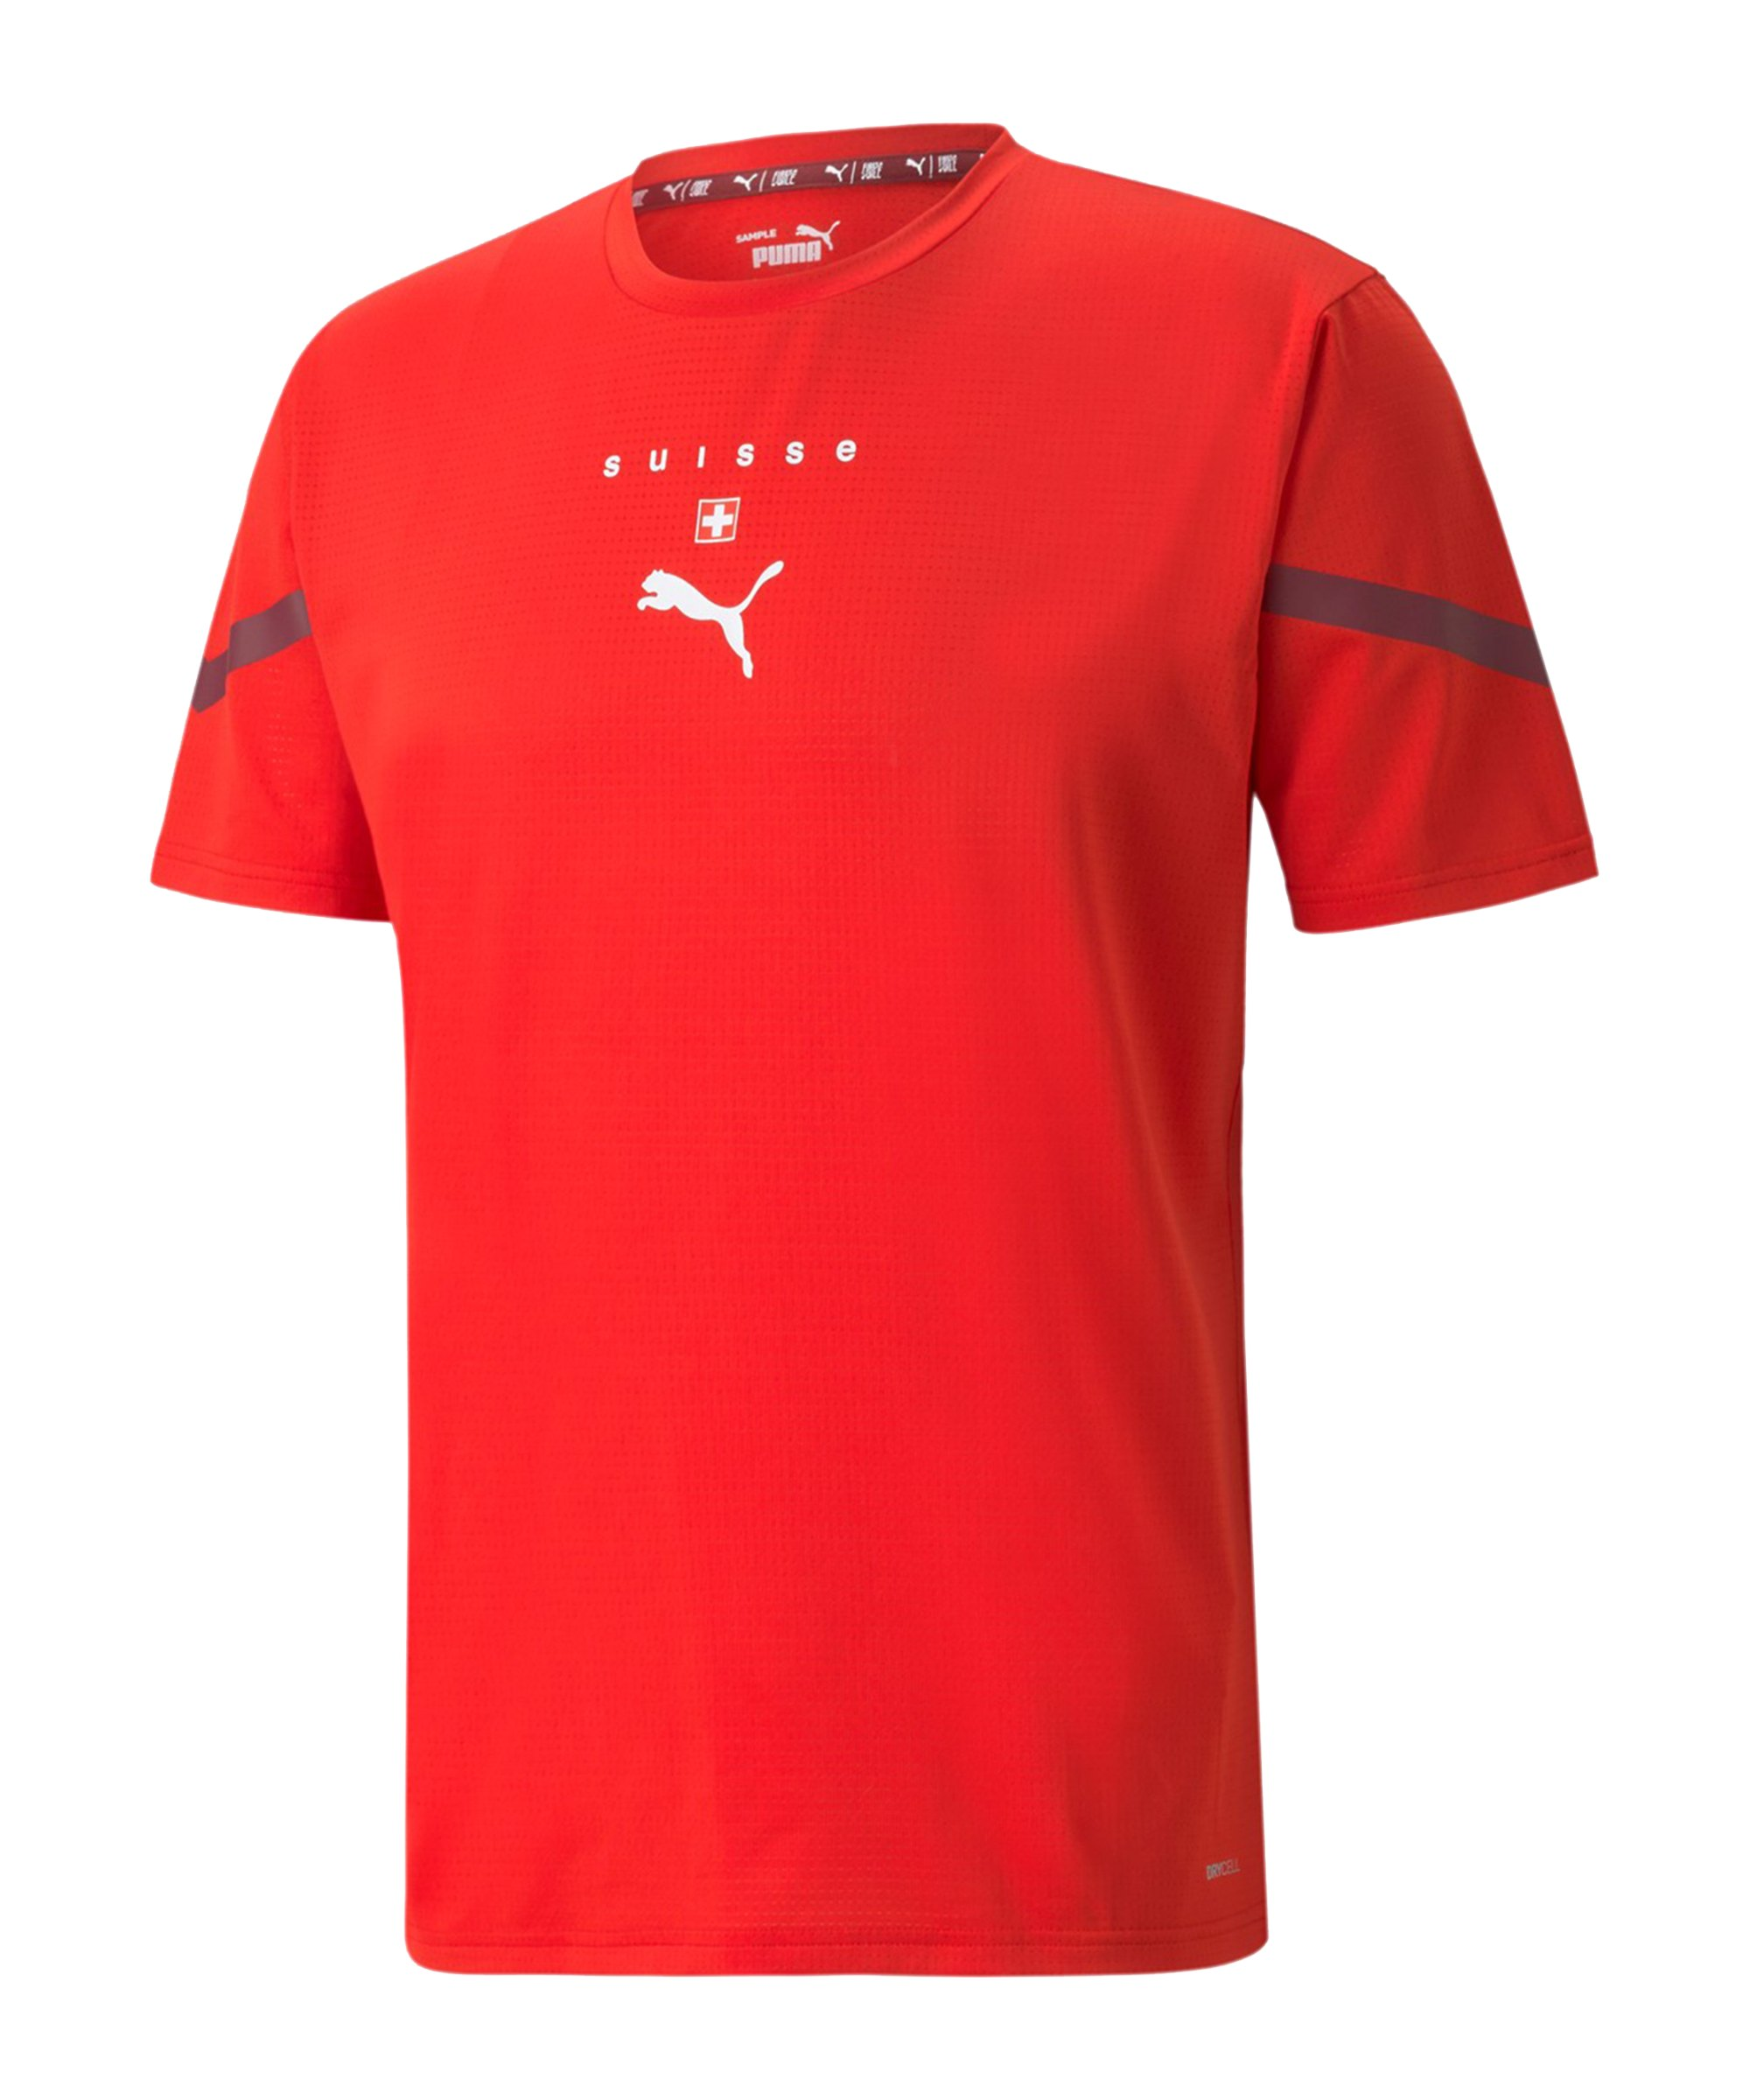 PUMA Schweiz Prematch Shirt 2021/2022 Rot F13 - rot